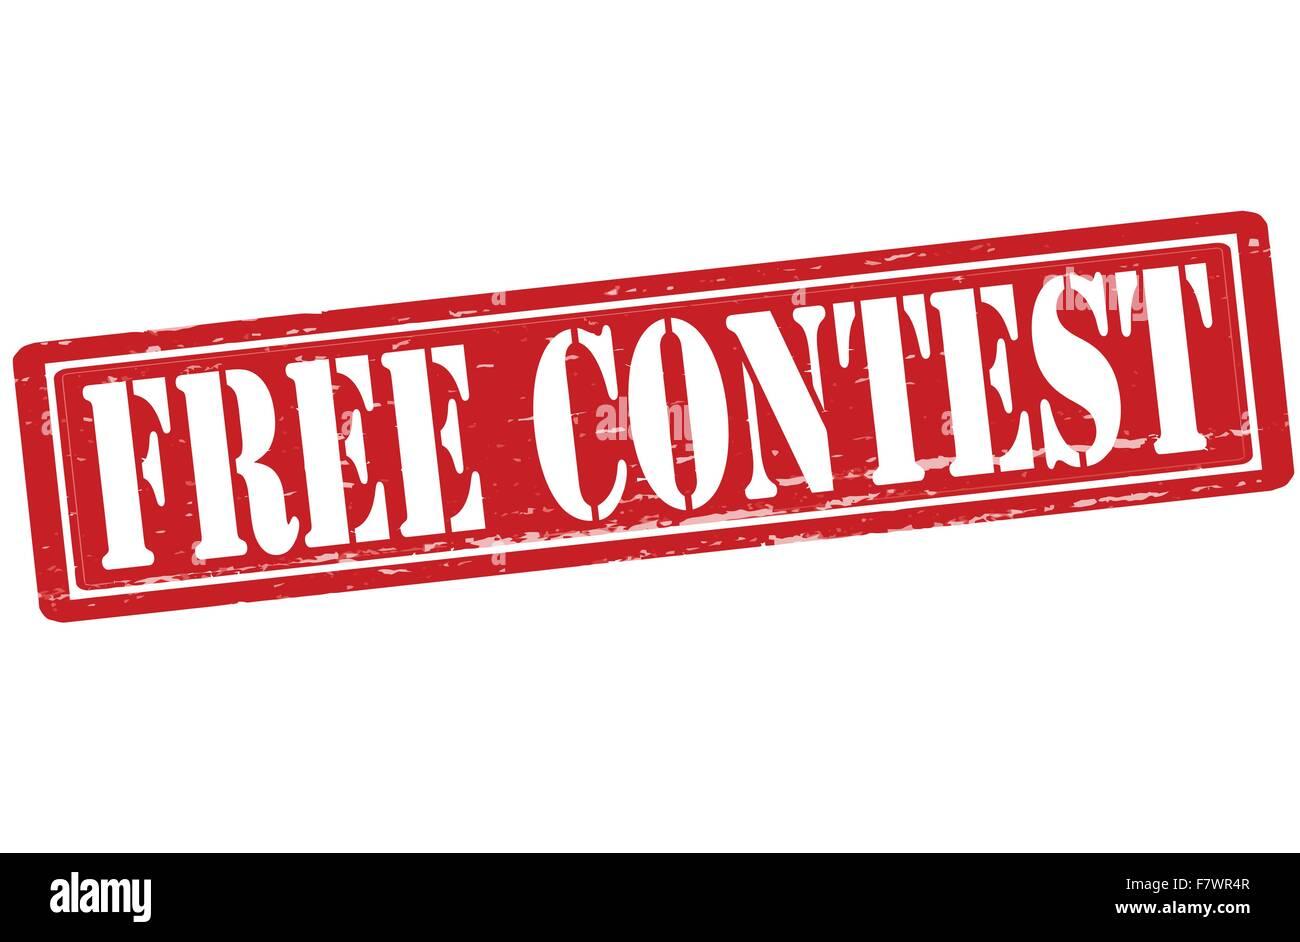 Free contest - Stock Image